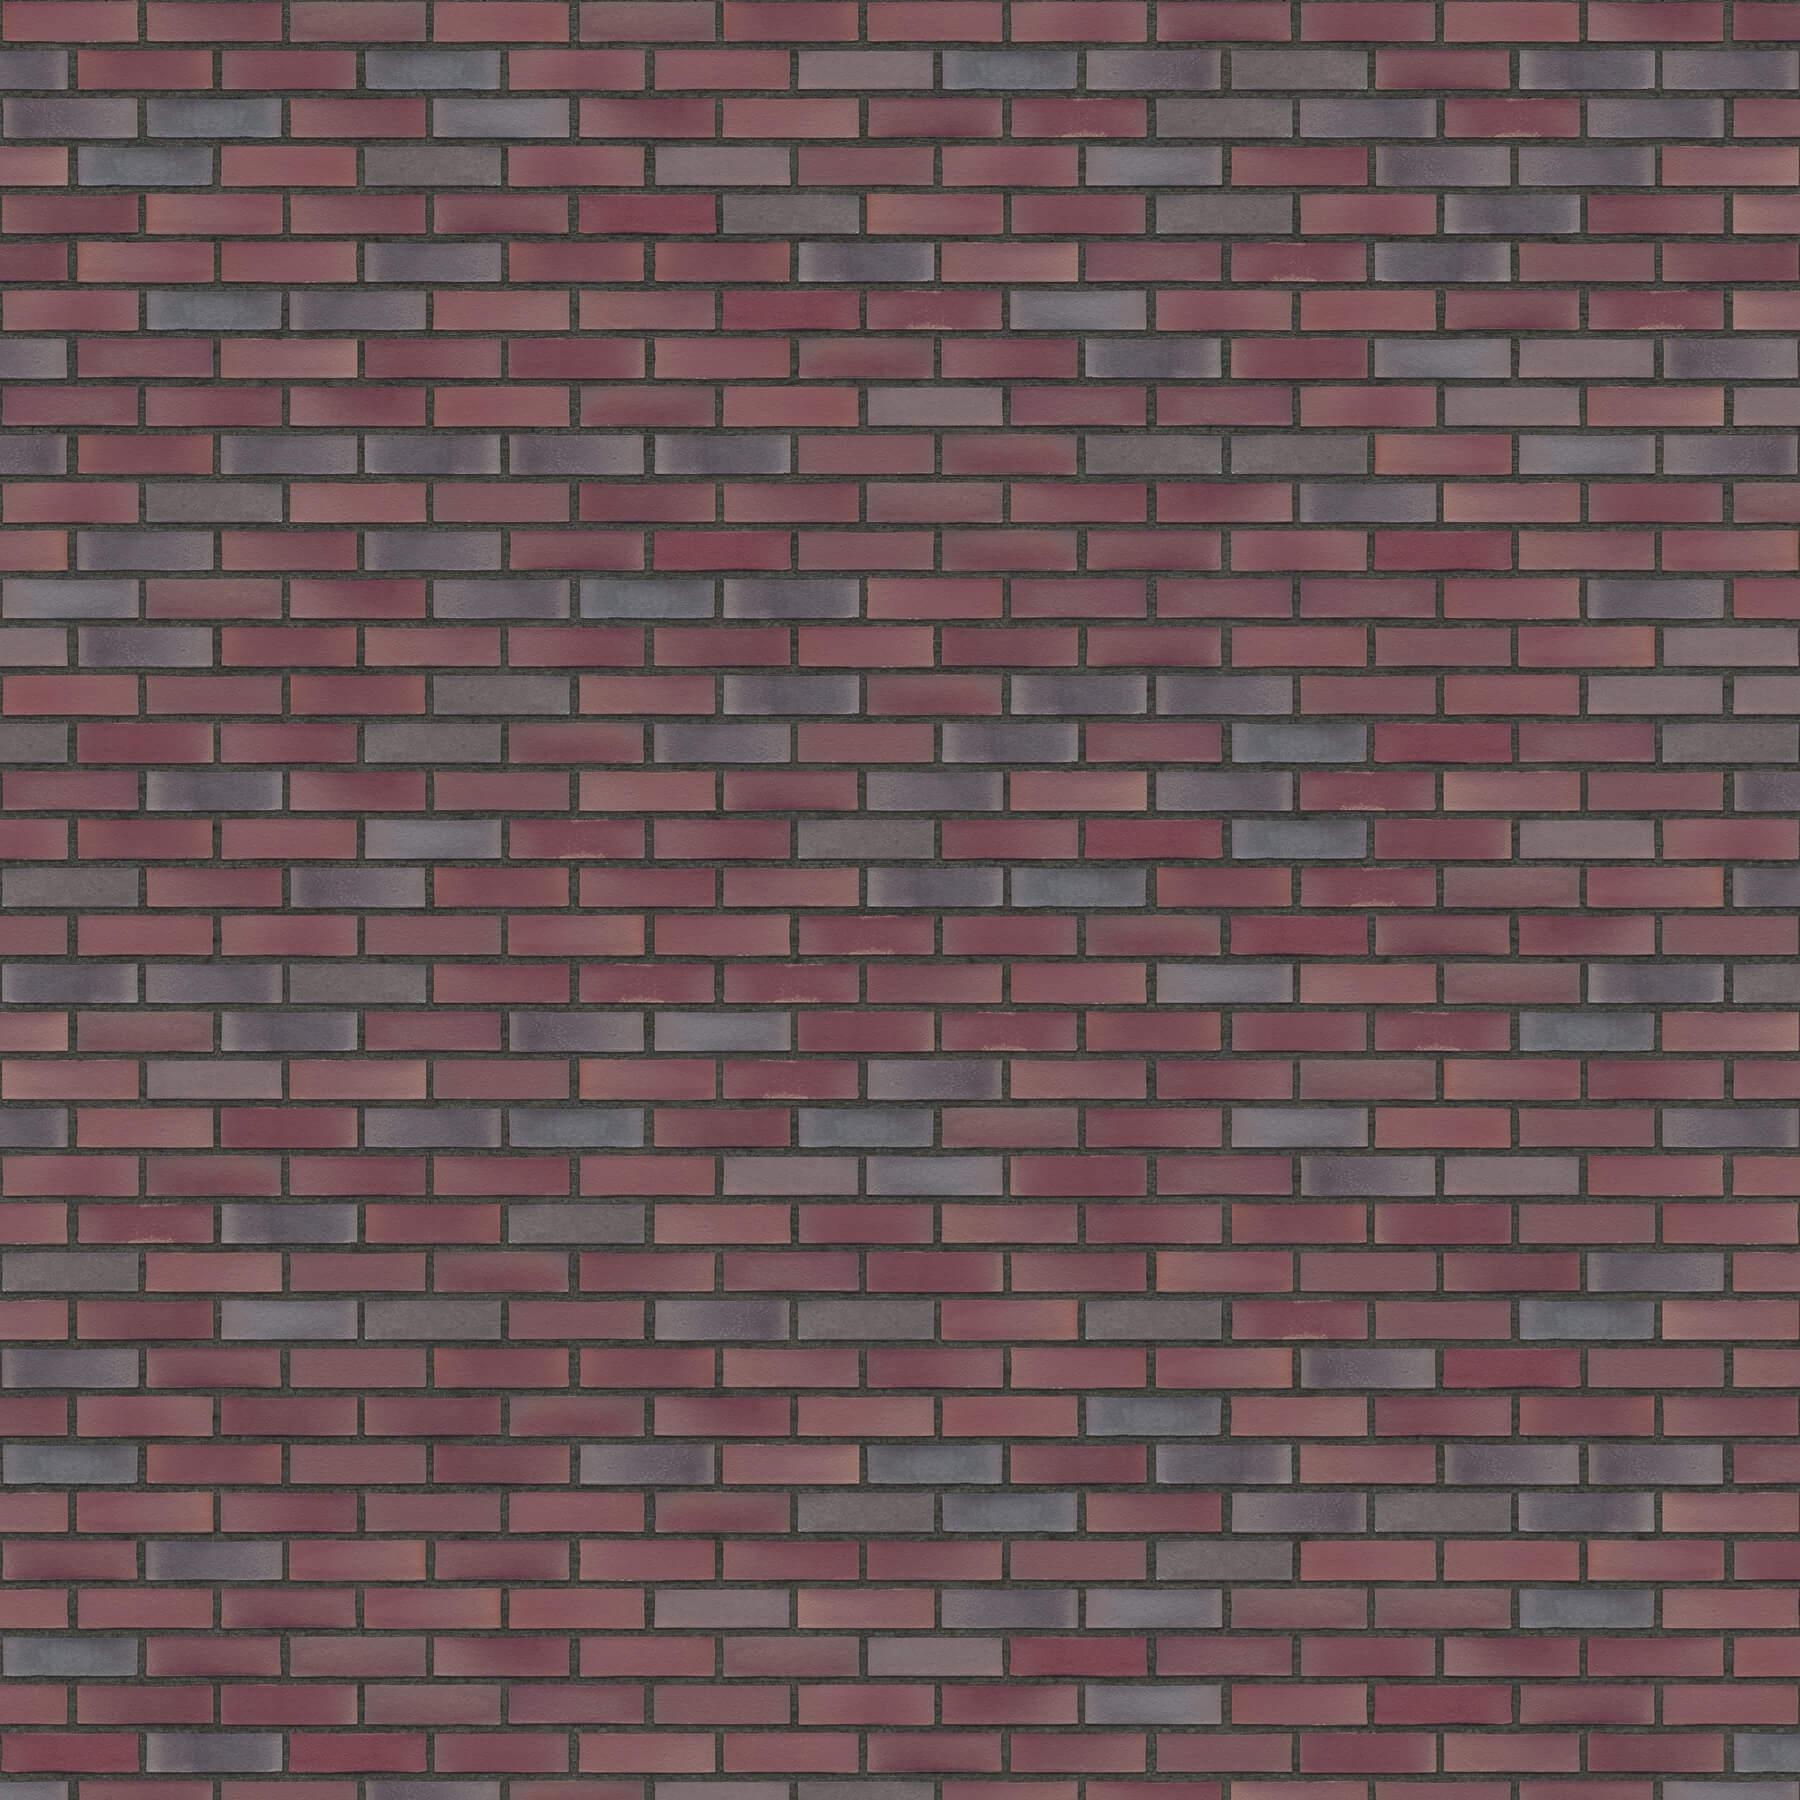 Puna-cigla-FeldHaus-Klinker-brick-ho-beograd-nf-k-380-Antracit Fuga